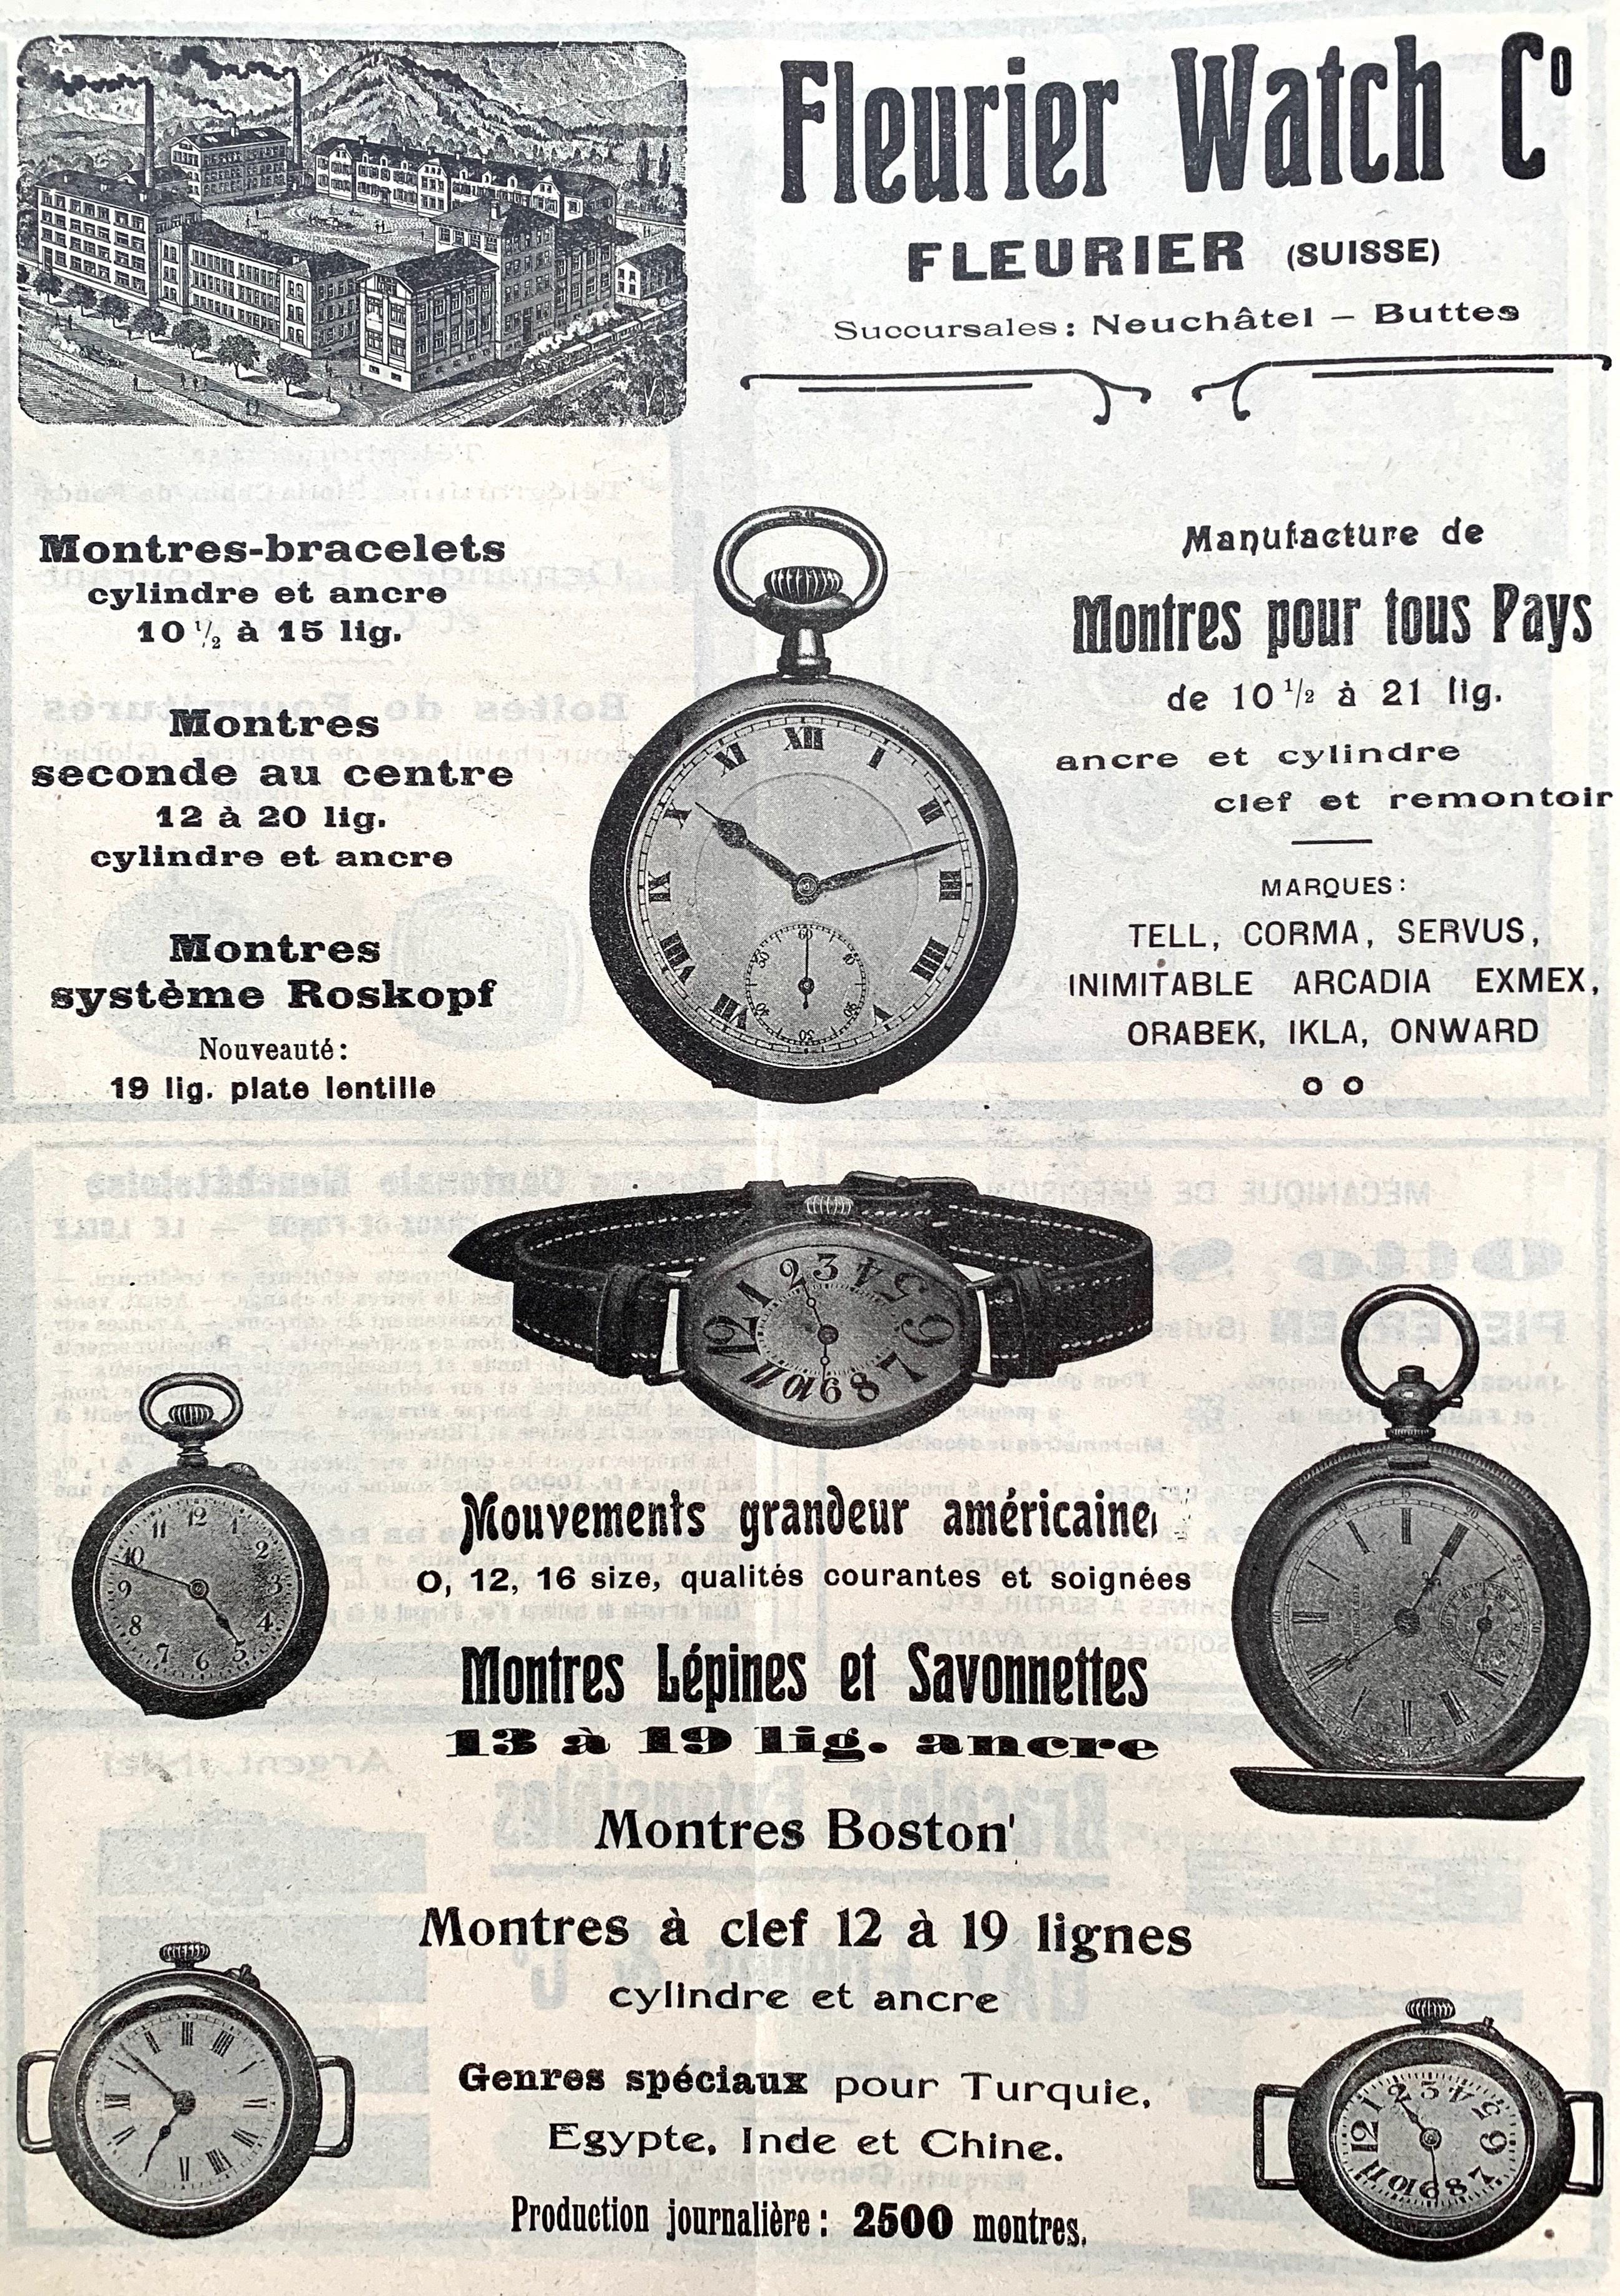 1920 Fleurier_Watch_montres_lepine 1920